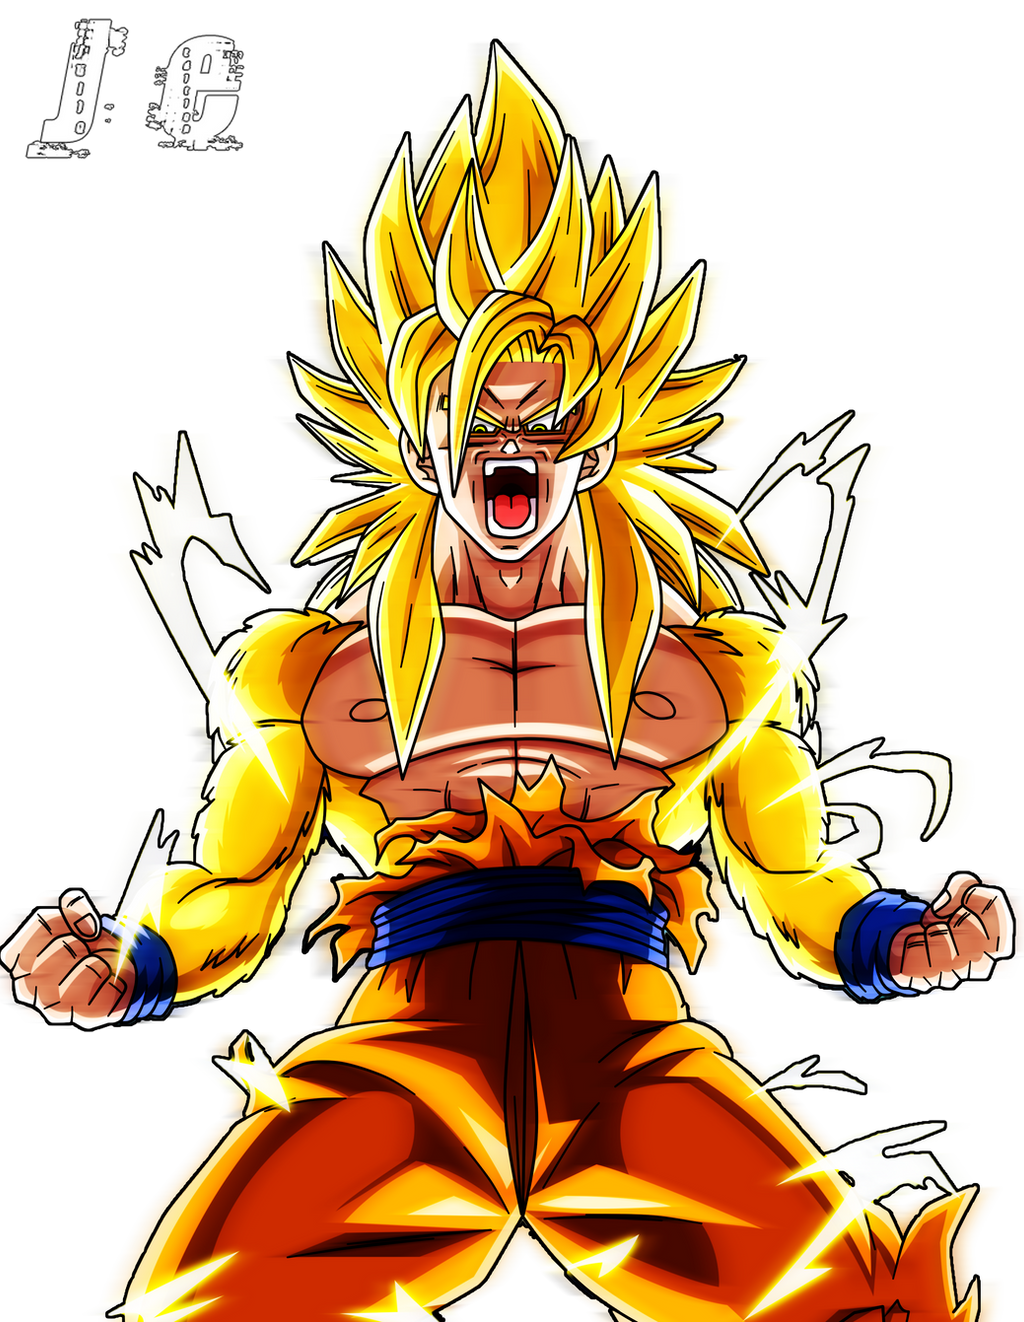 ultra - Goku ultra saiyajin ssj 4 con extra - Página 2 Render_de_kakarotto_ssj_dios_dorado_by_juliox11-d75p670